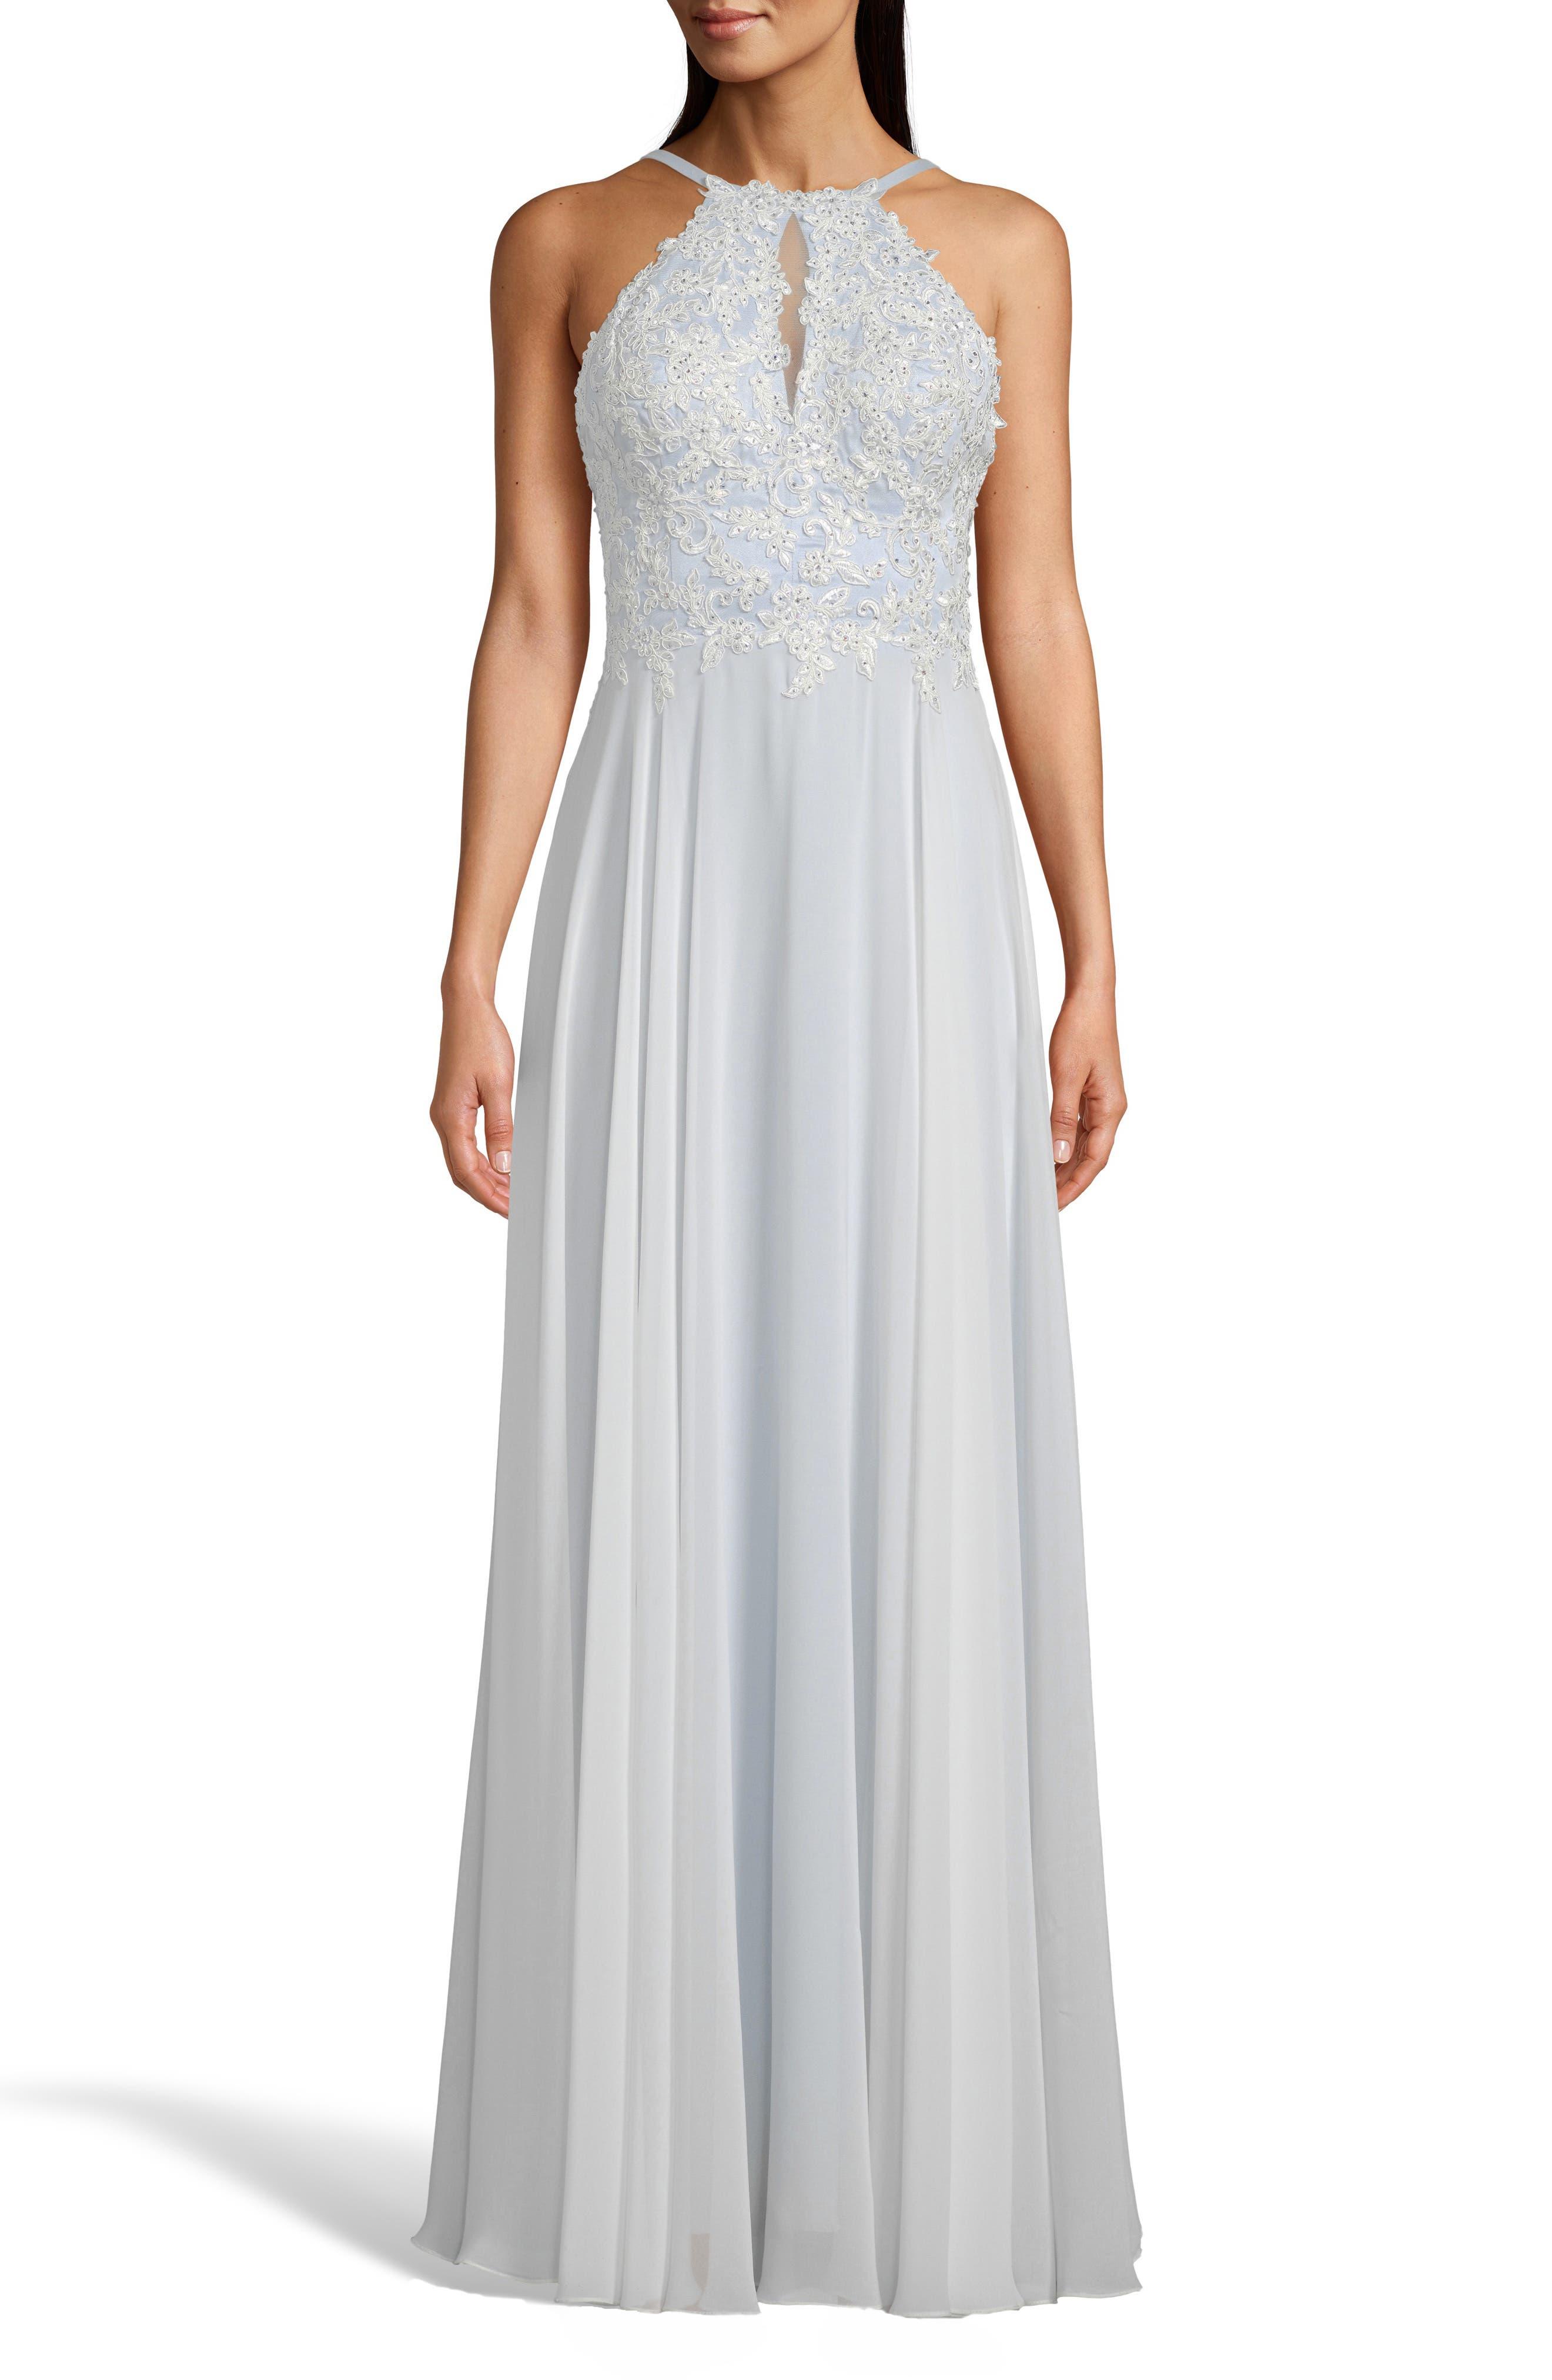 5c3636fab2b8 Xscape Beaded 3D Floral Lace Chiffon Evening Dress